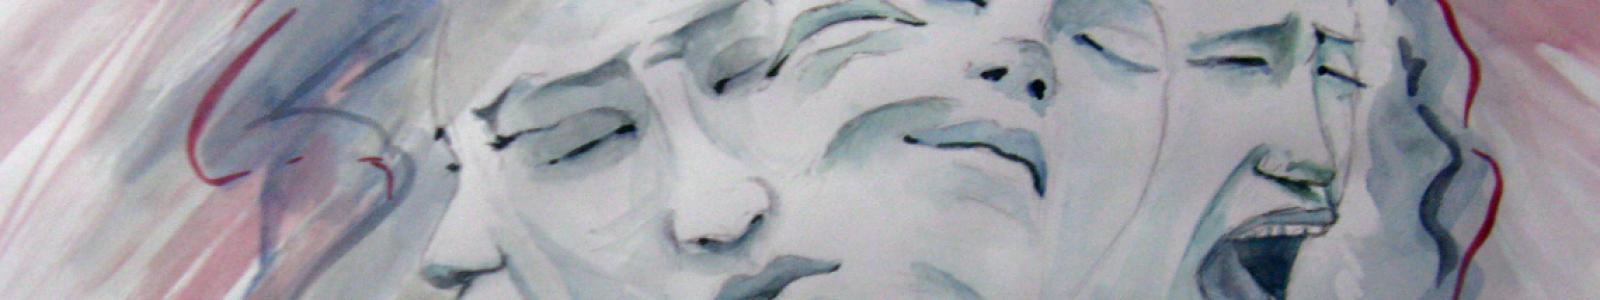 Gallery Painter Sitora Brejneva-Muradova